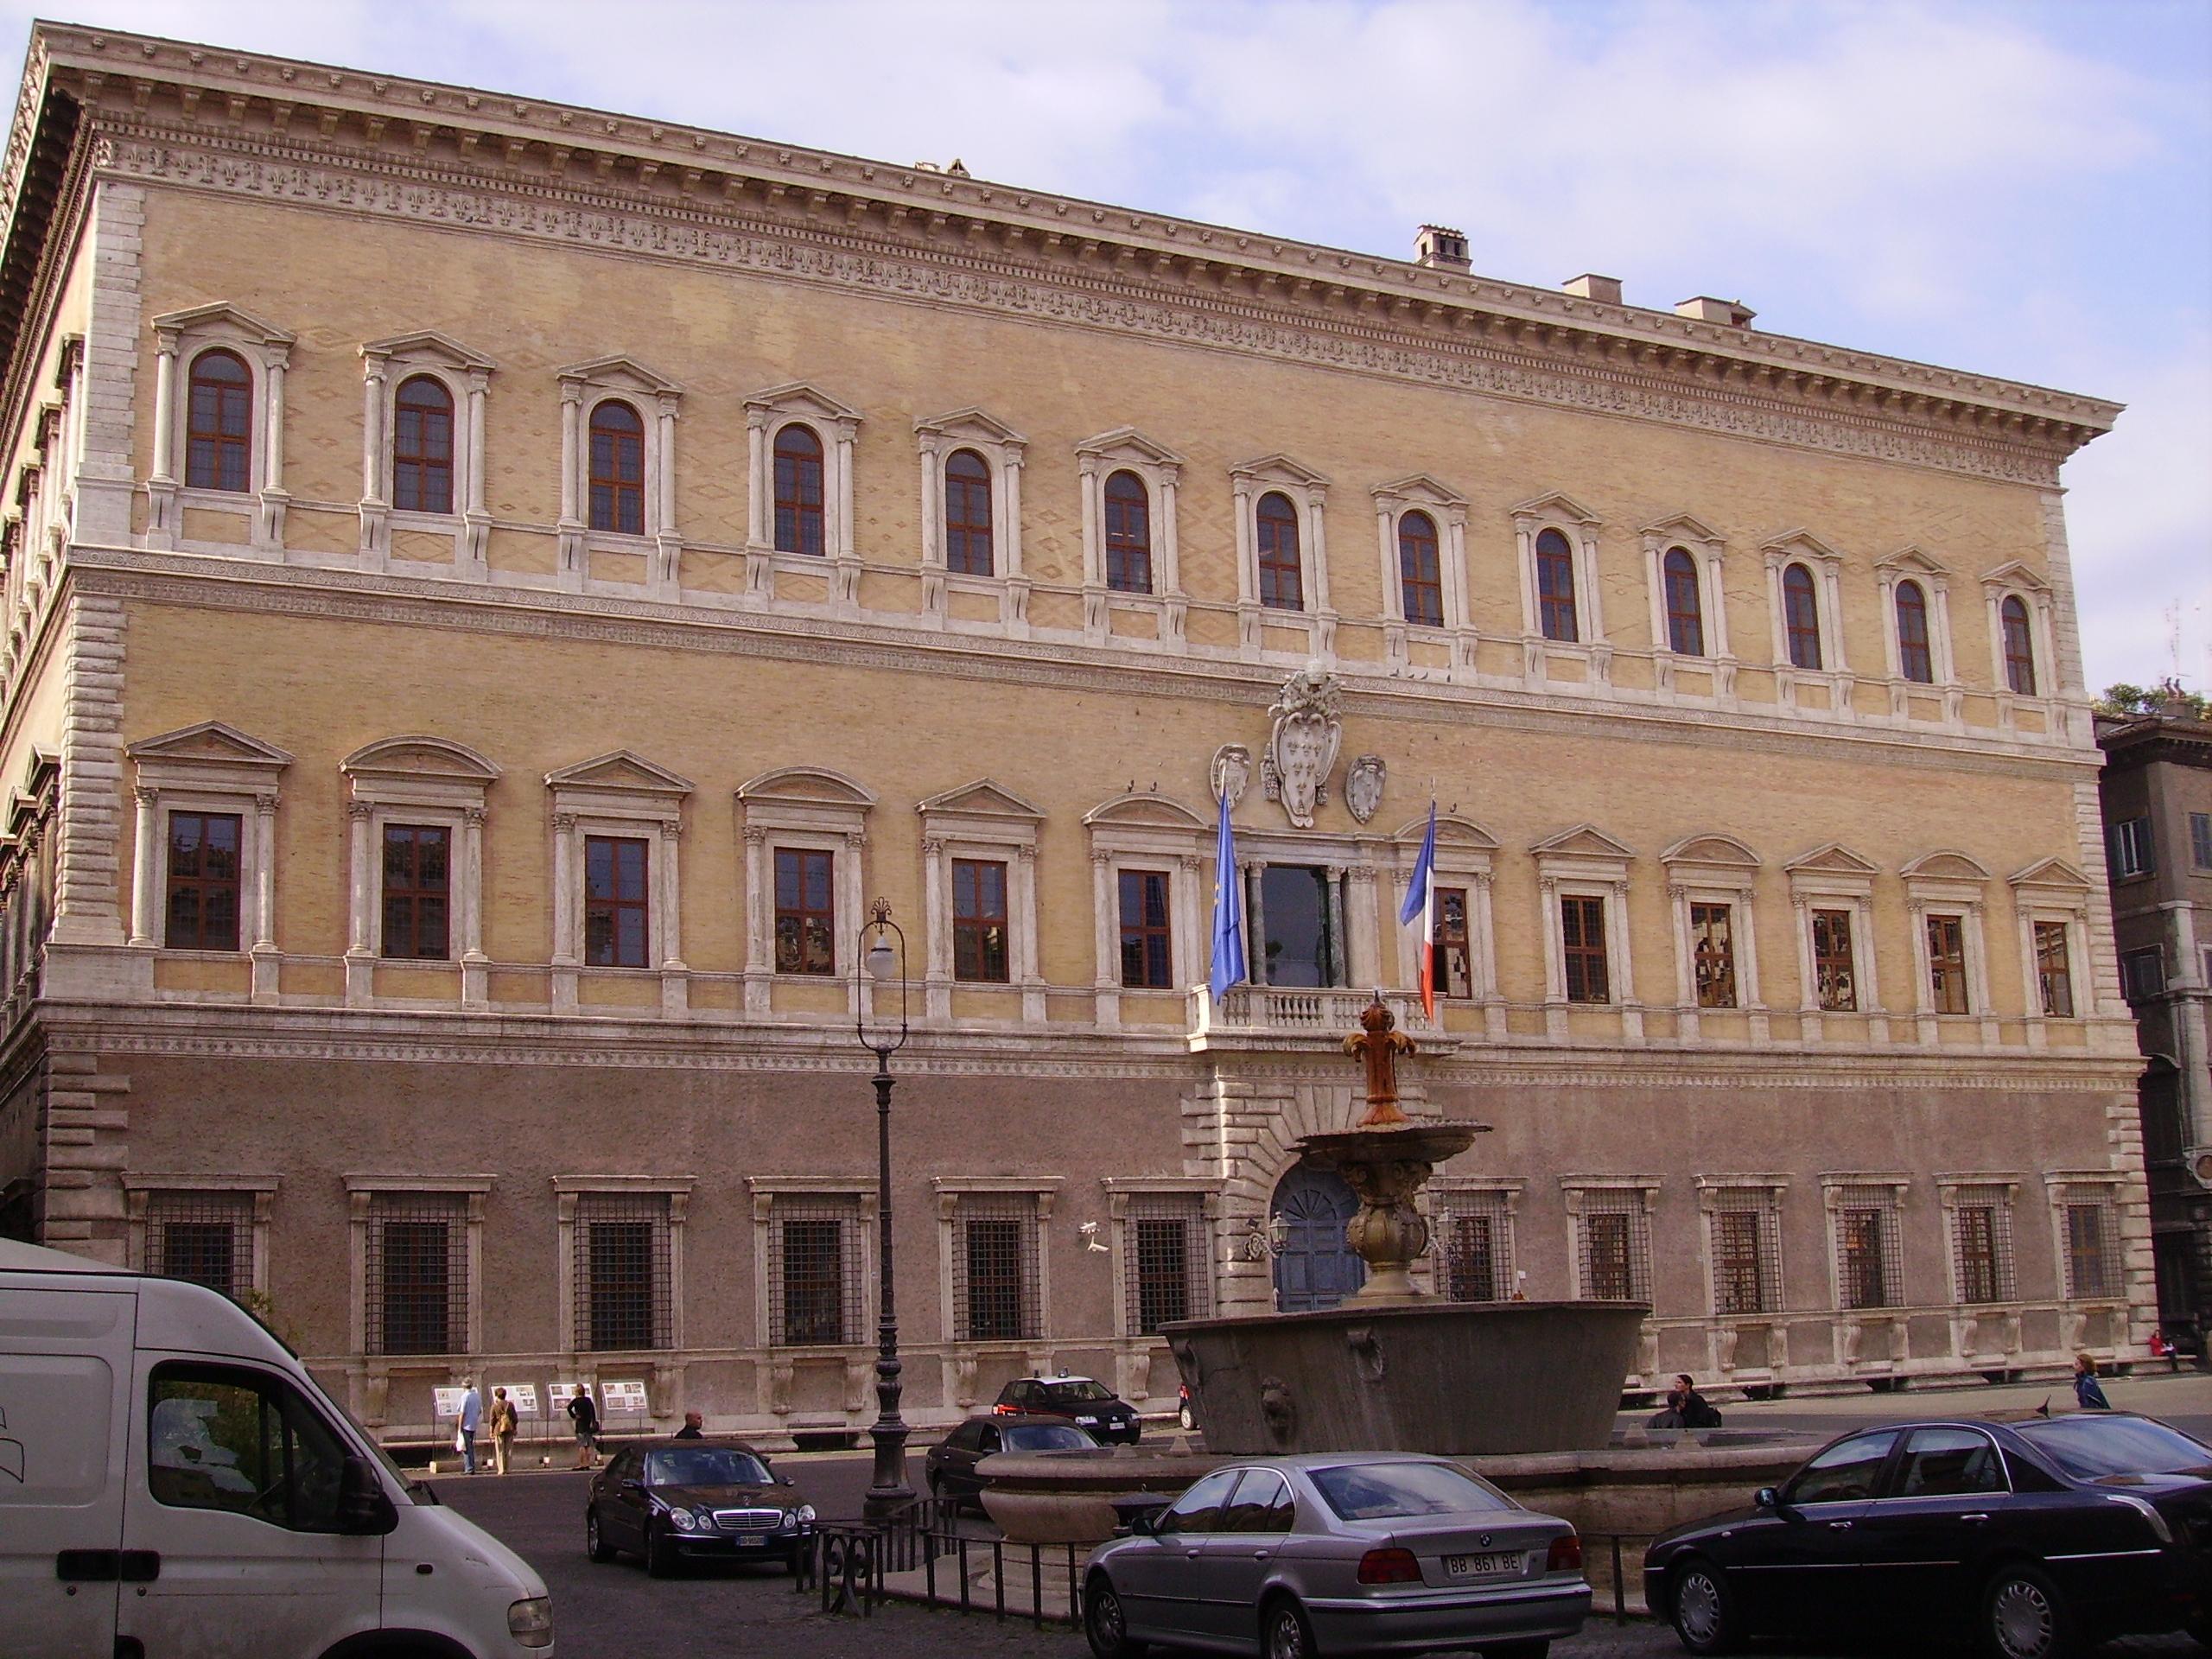 palazzo farnese - photo #14